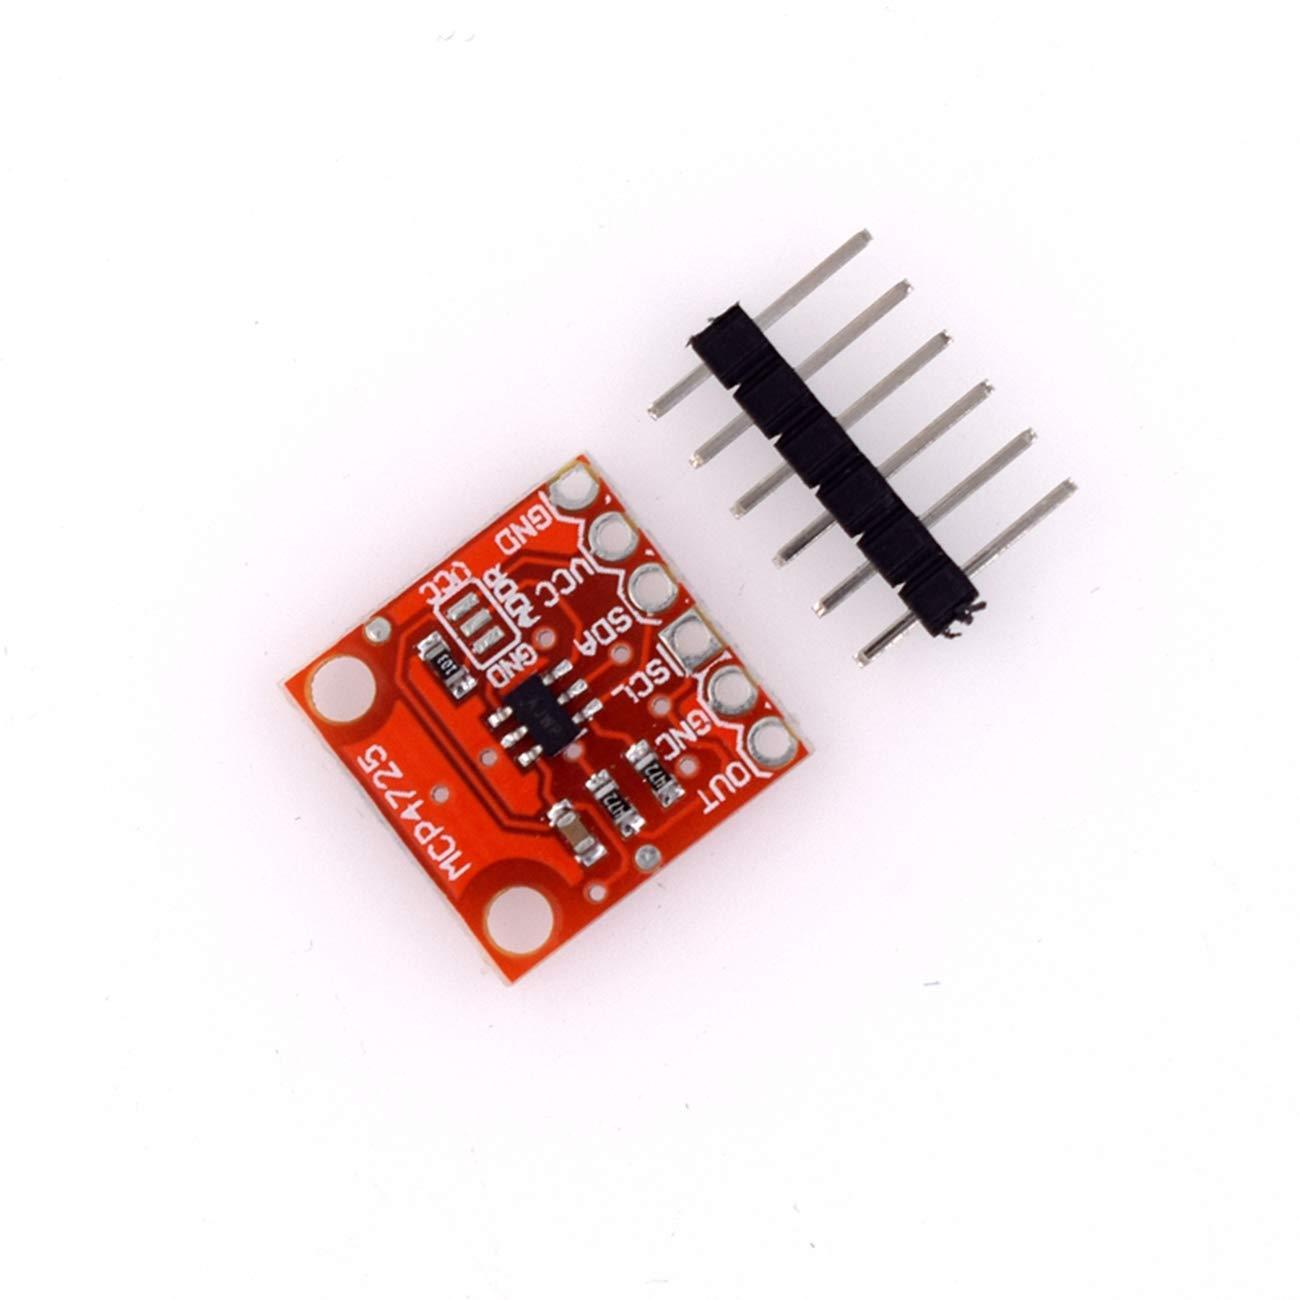 1pcs/lot MCP4725 I2C DAC Breakout Module Development Board